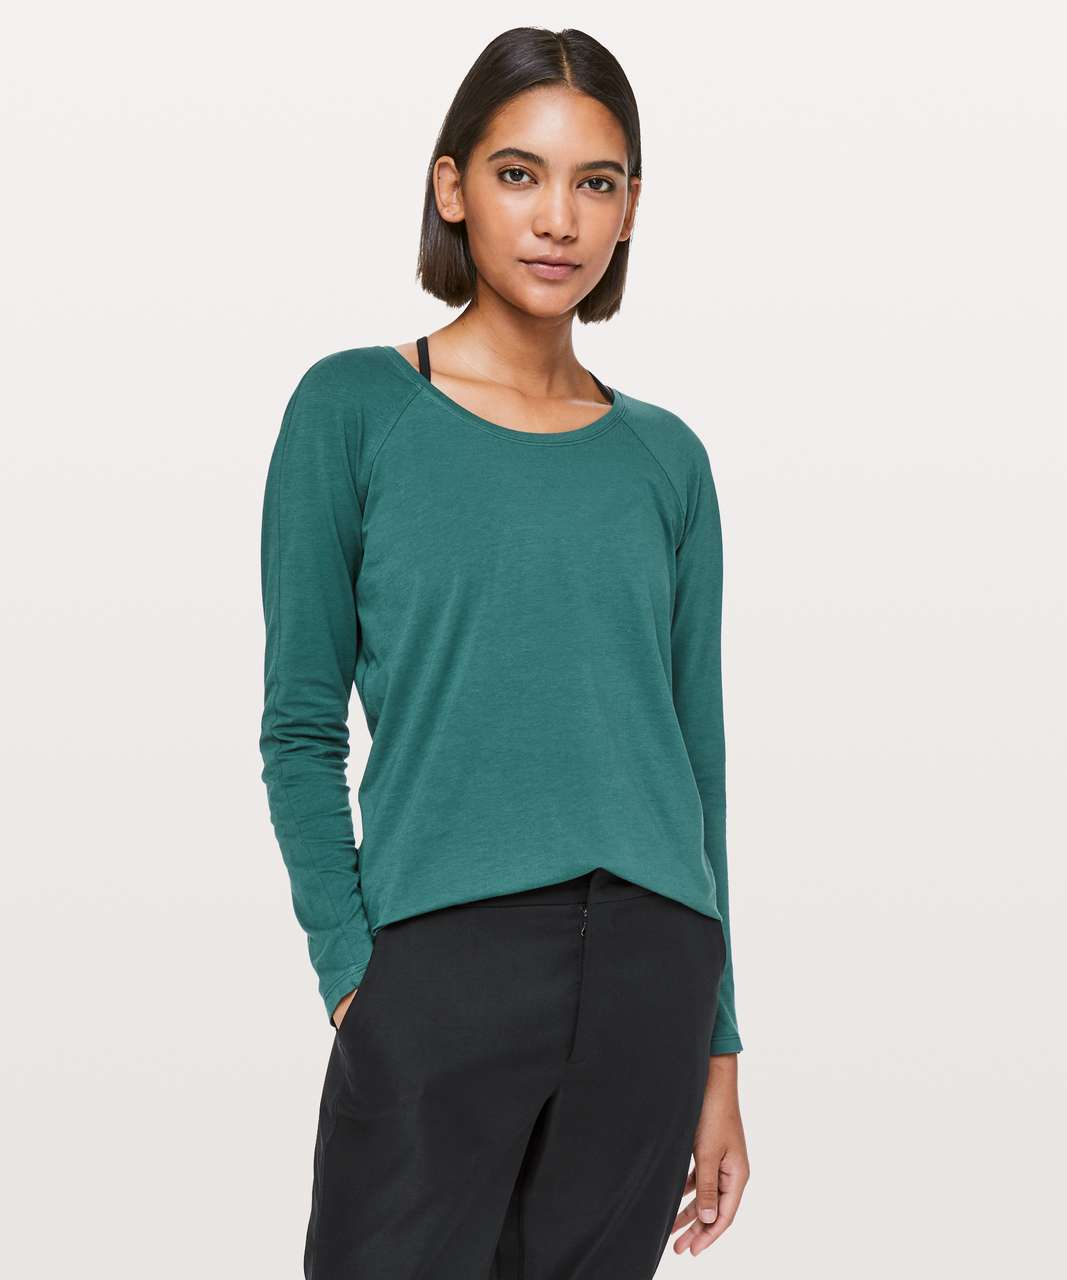 Lululemon Emerald Long Sleeve - Green Jasper